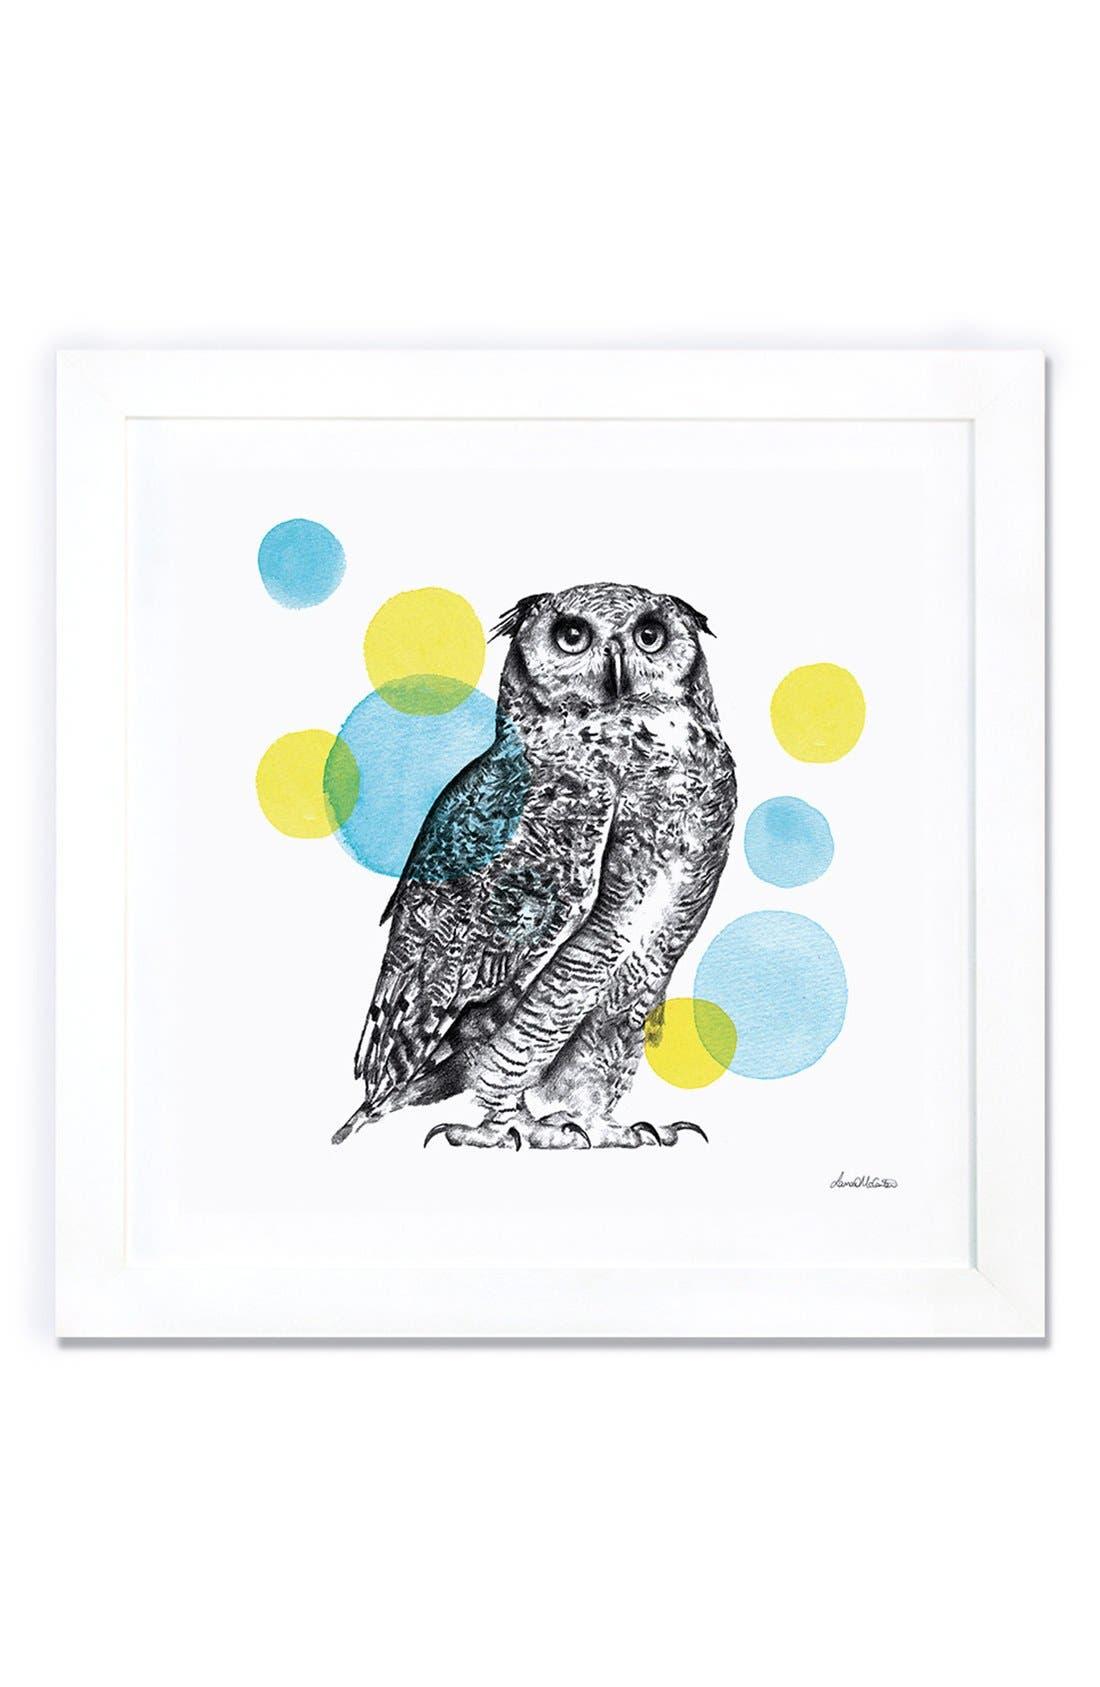 'Sketchbook - Owl' Giclée Print Framed Canvas Art,                             Main thumbnail 1, color,                             100